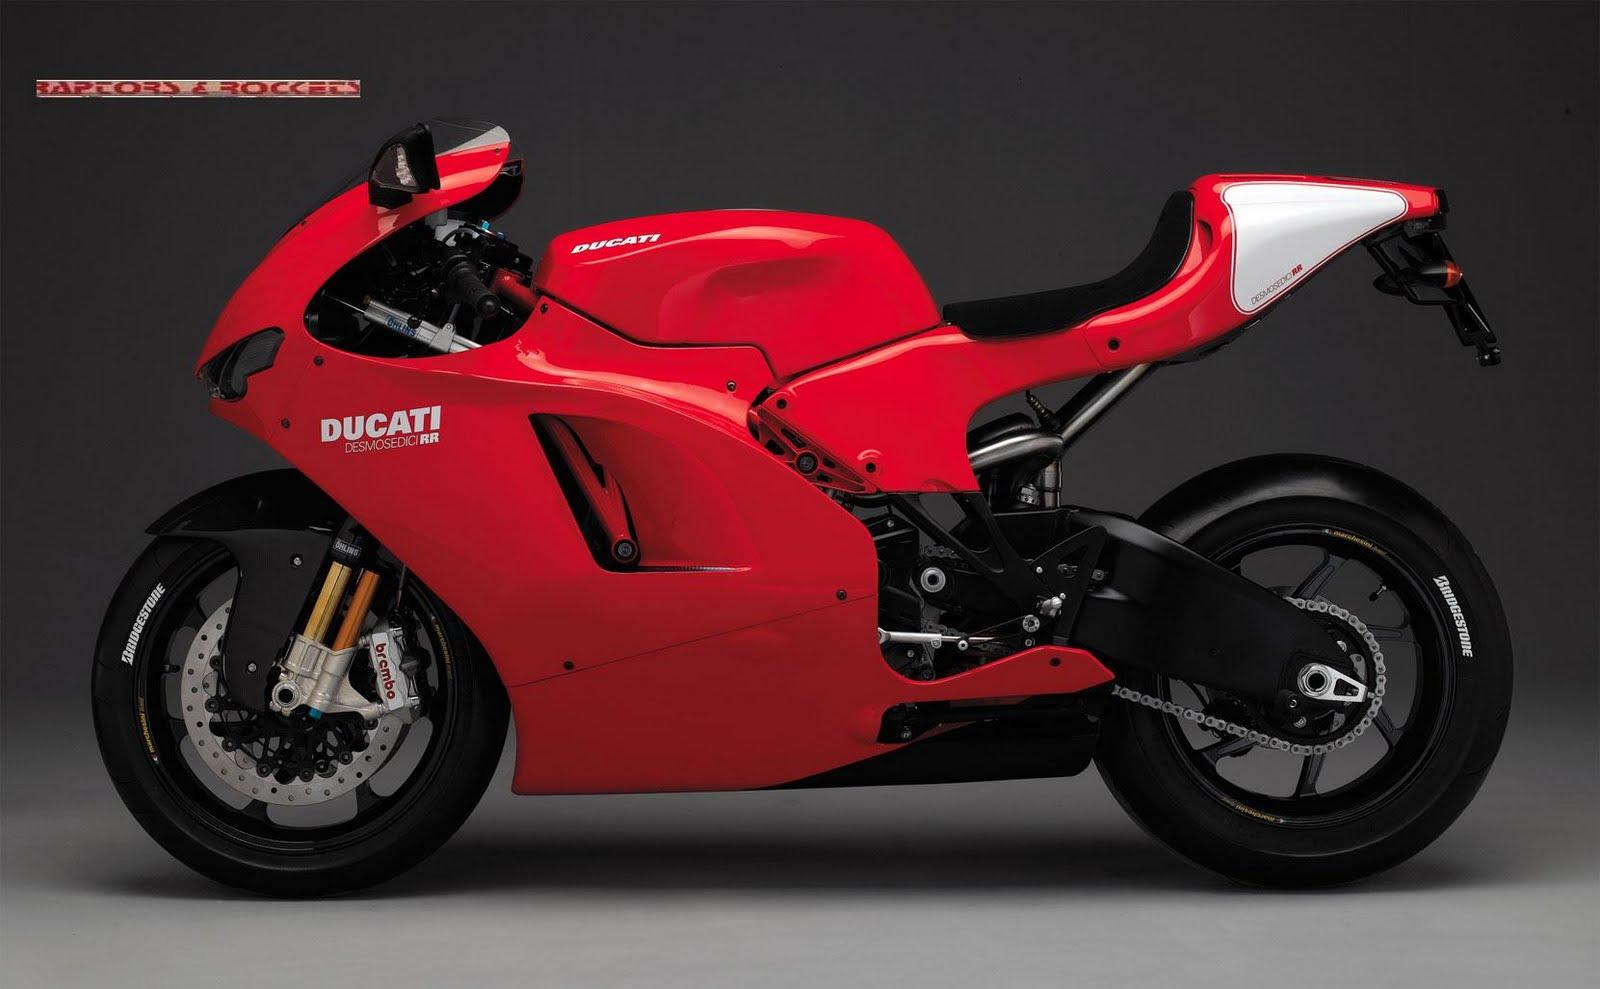 Beautiful Bikes Ducati Desmosedici Rr Exhaust